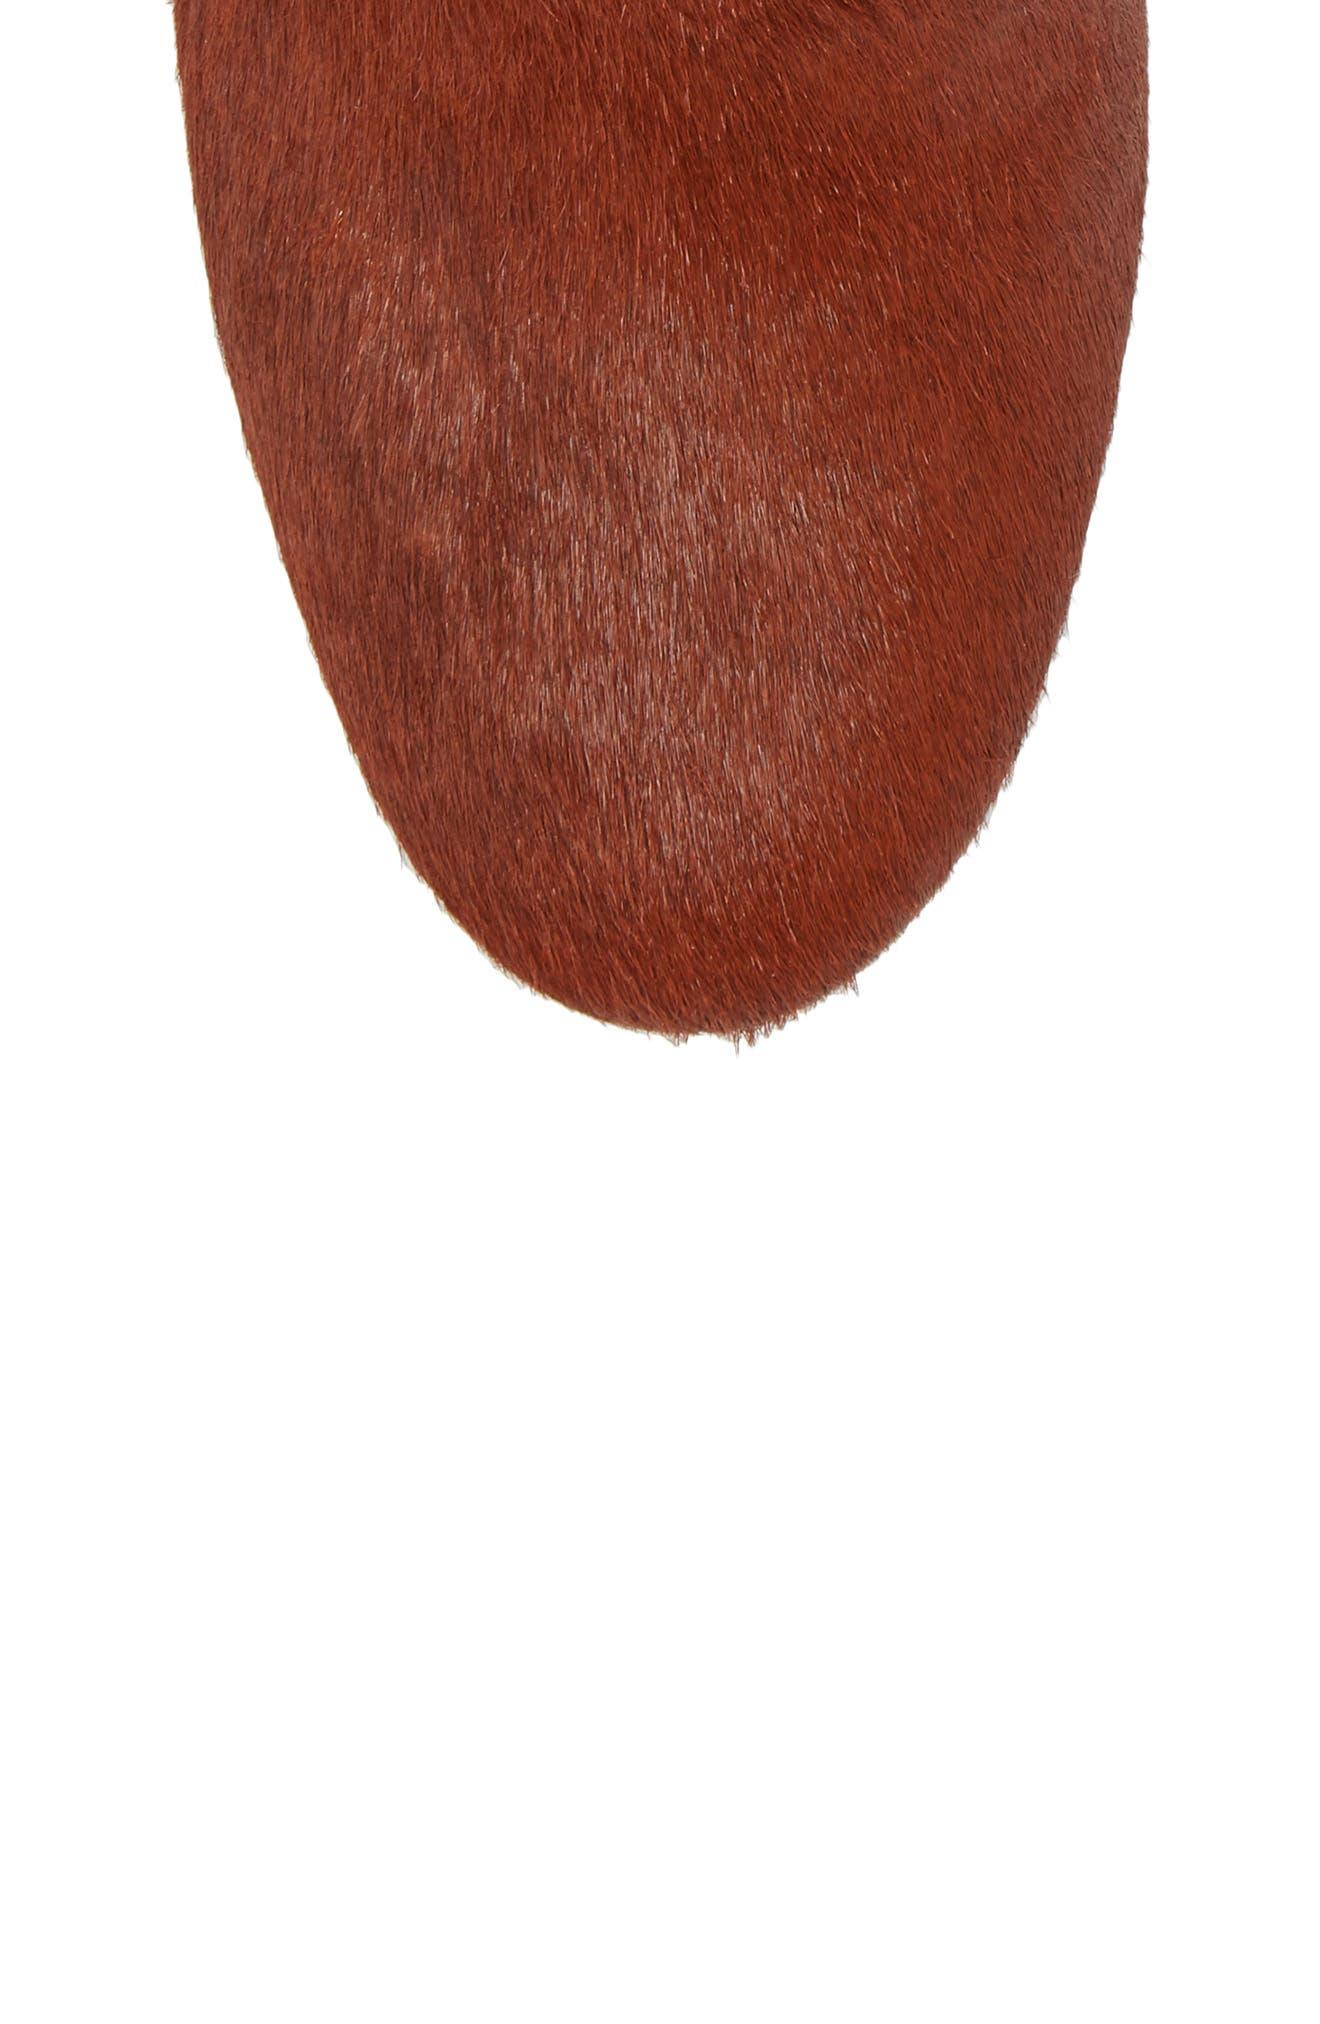 Cassidy Genuine Calf Hair Block Heel Bootie,                             Alternate thumbnail 5, color,                             Terracotta Calf Hair